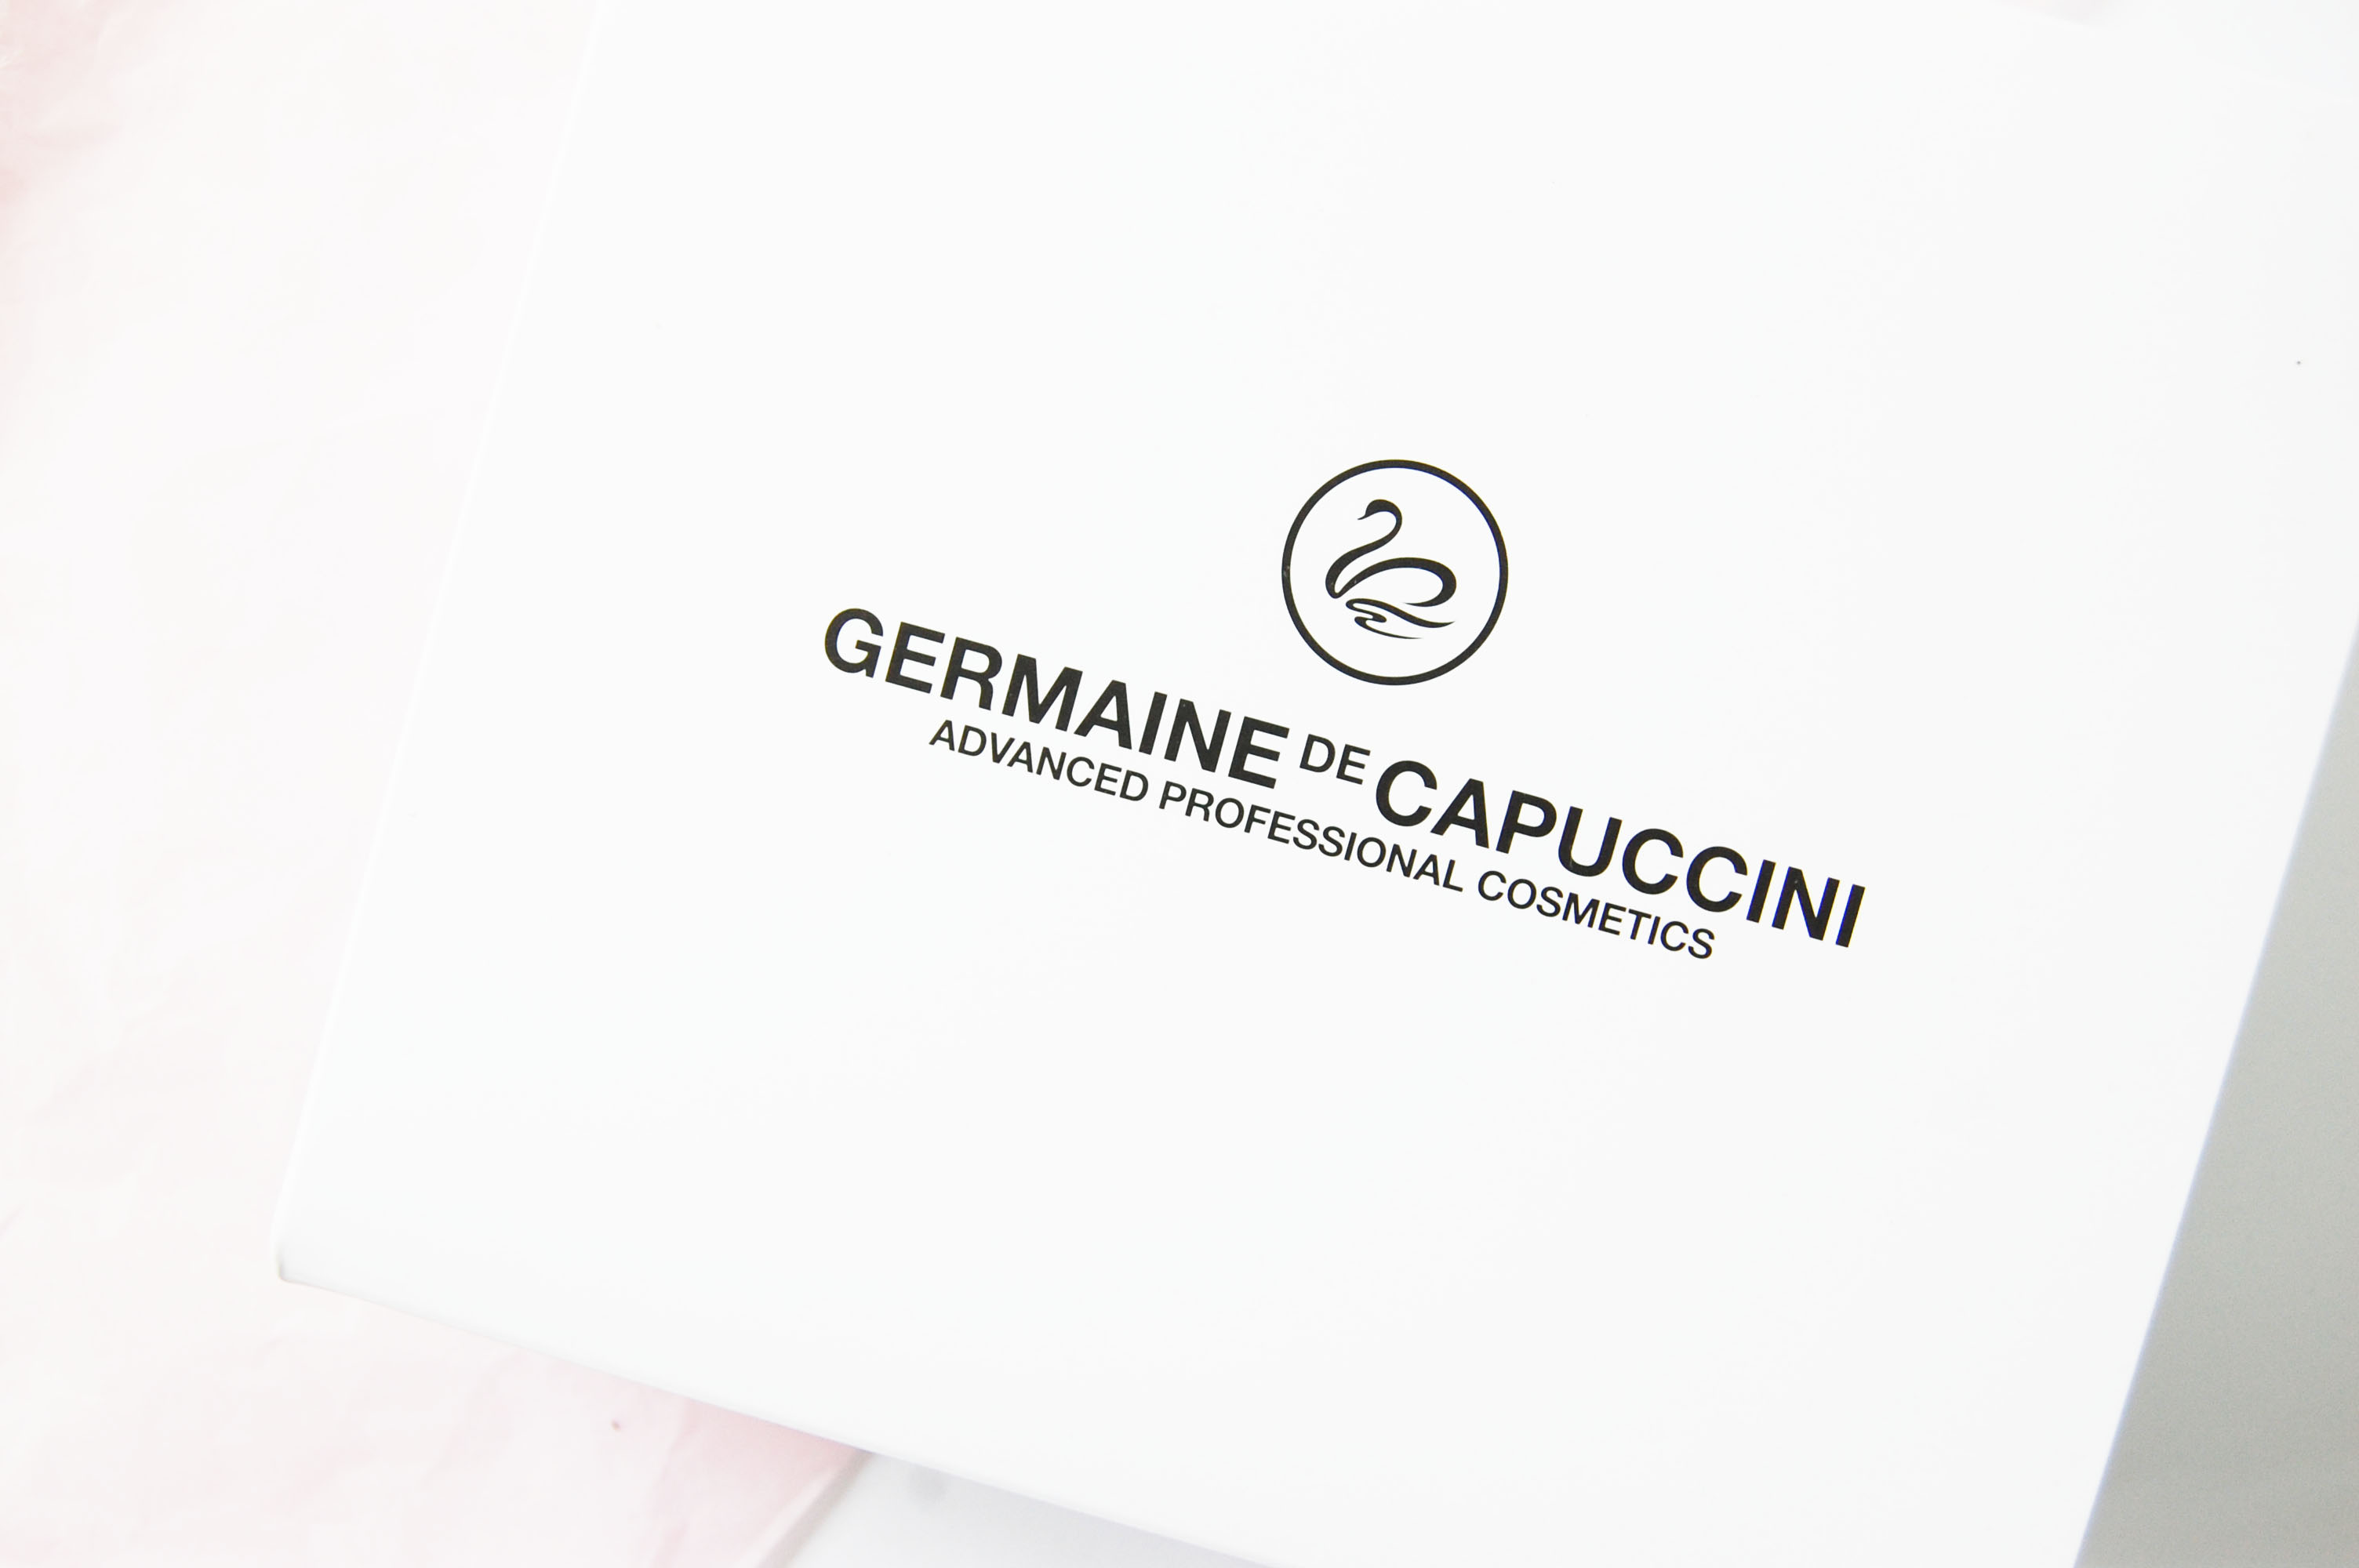 Germaine de Capuccini Custom Masks